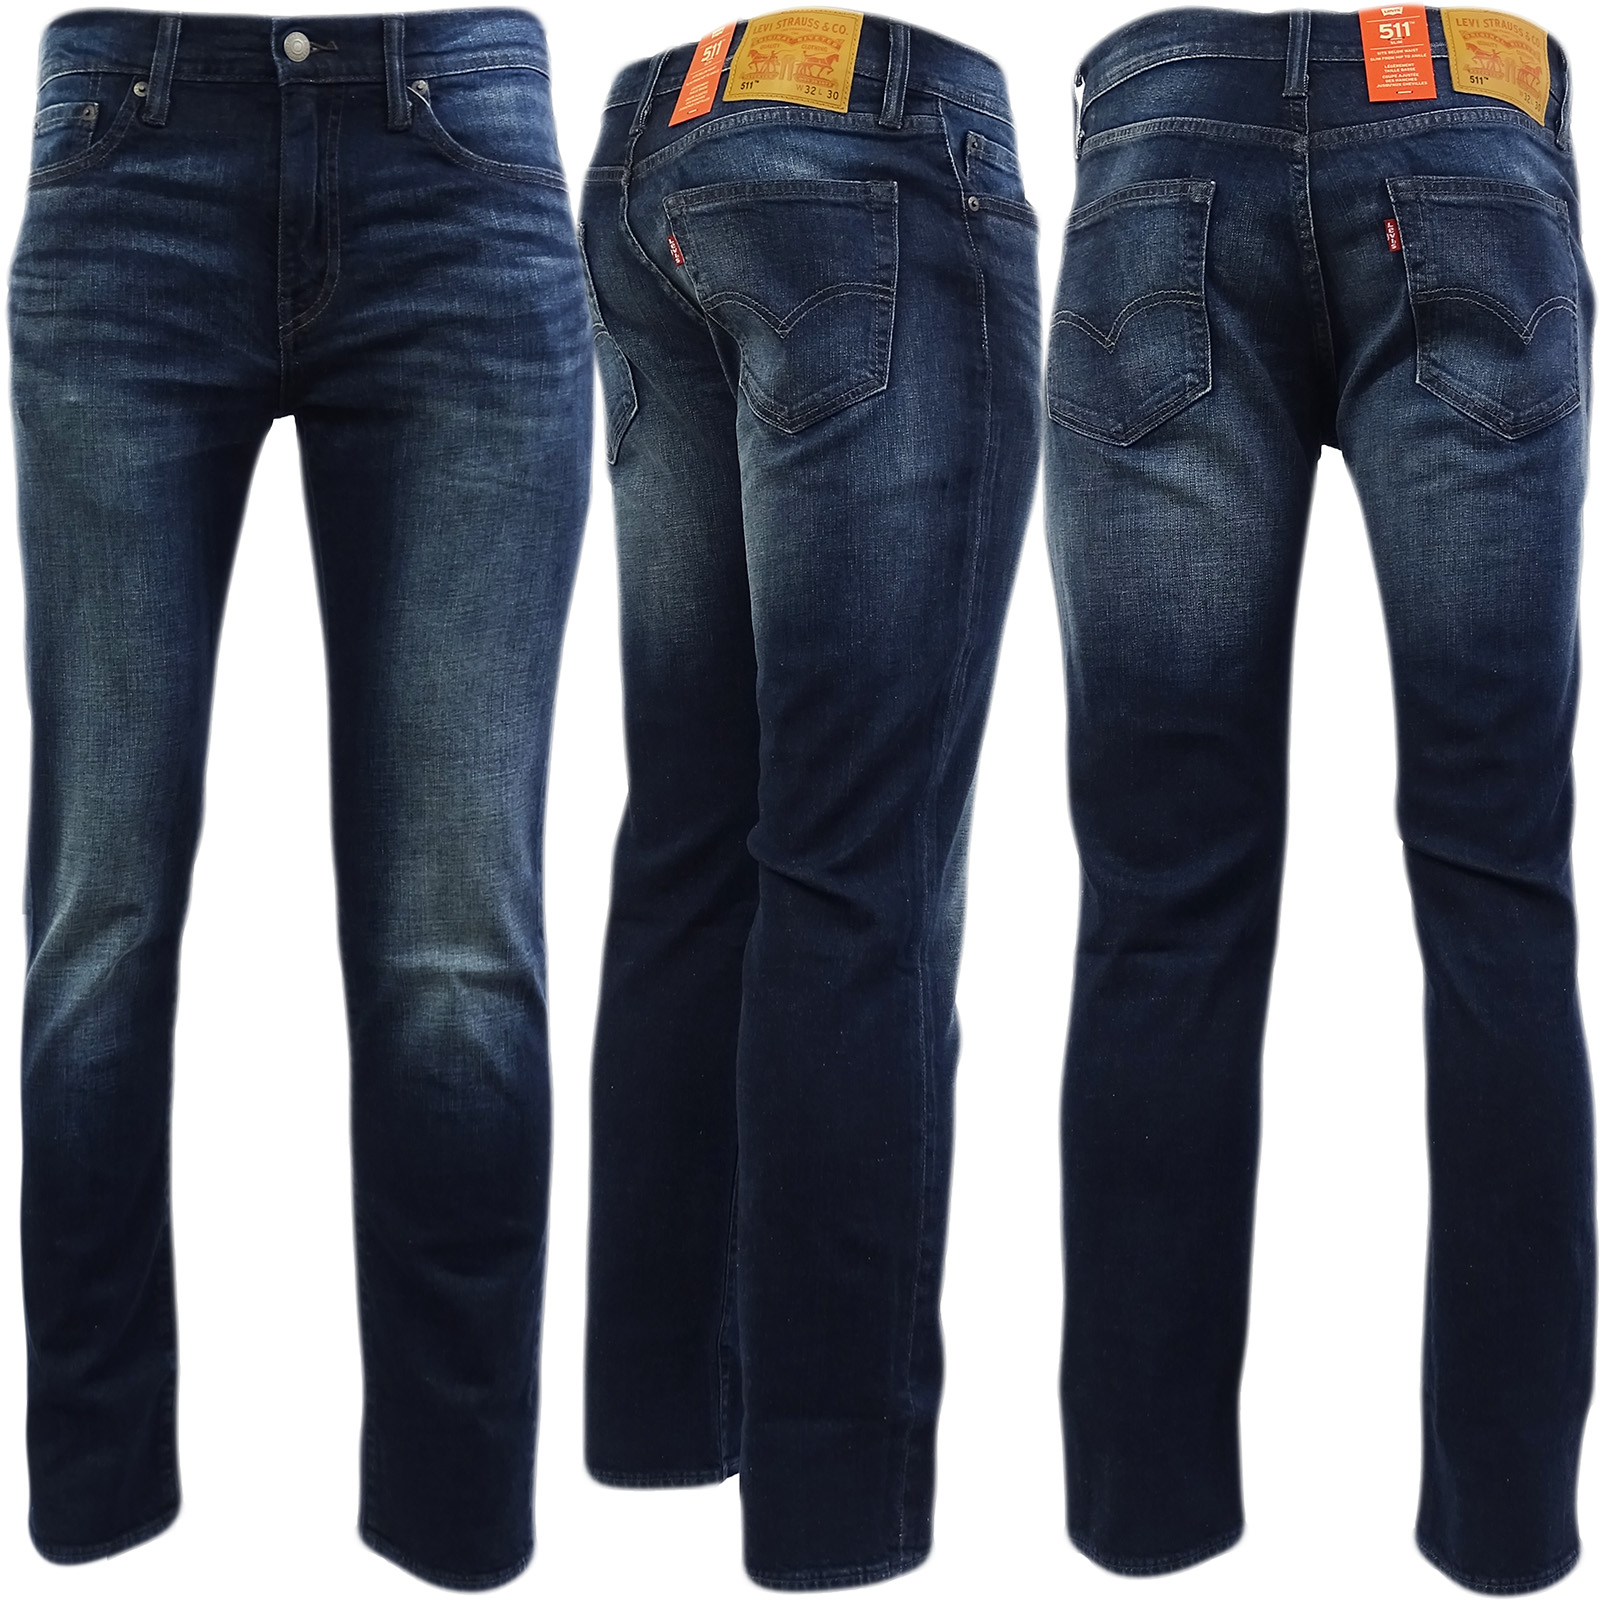 Levi s Men s 511 Slim Fit Jeans Blue 33w X 34l  9ddf90a8b6bfc